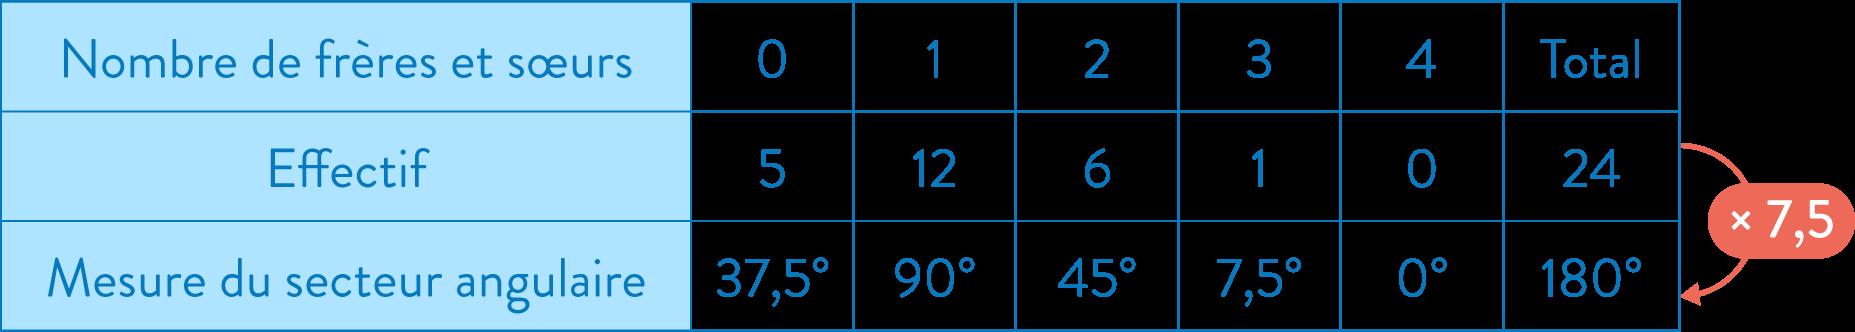 diagramme semi-circulaire statistiques